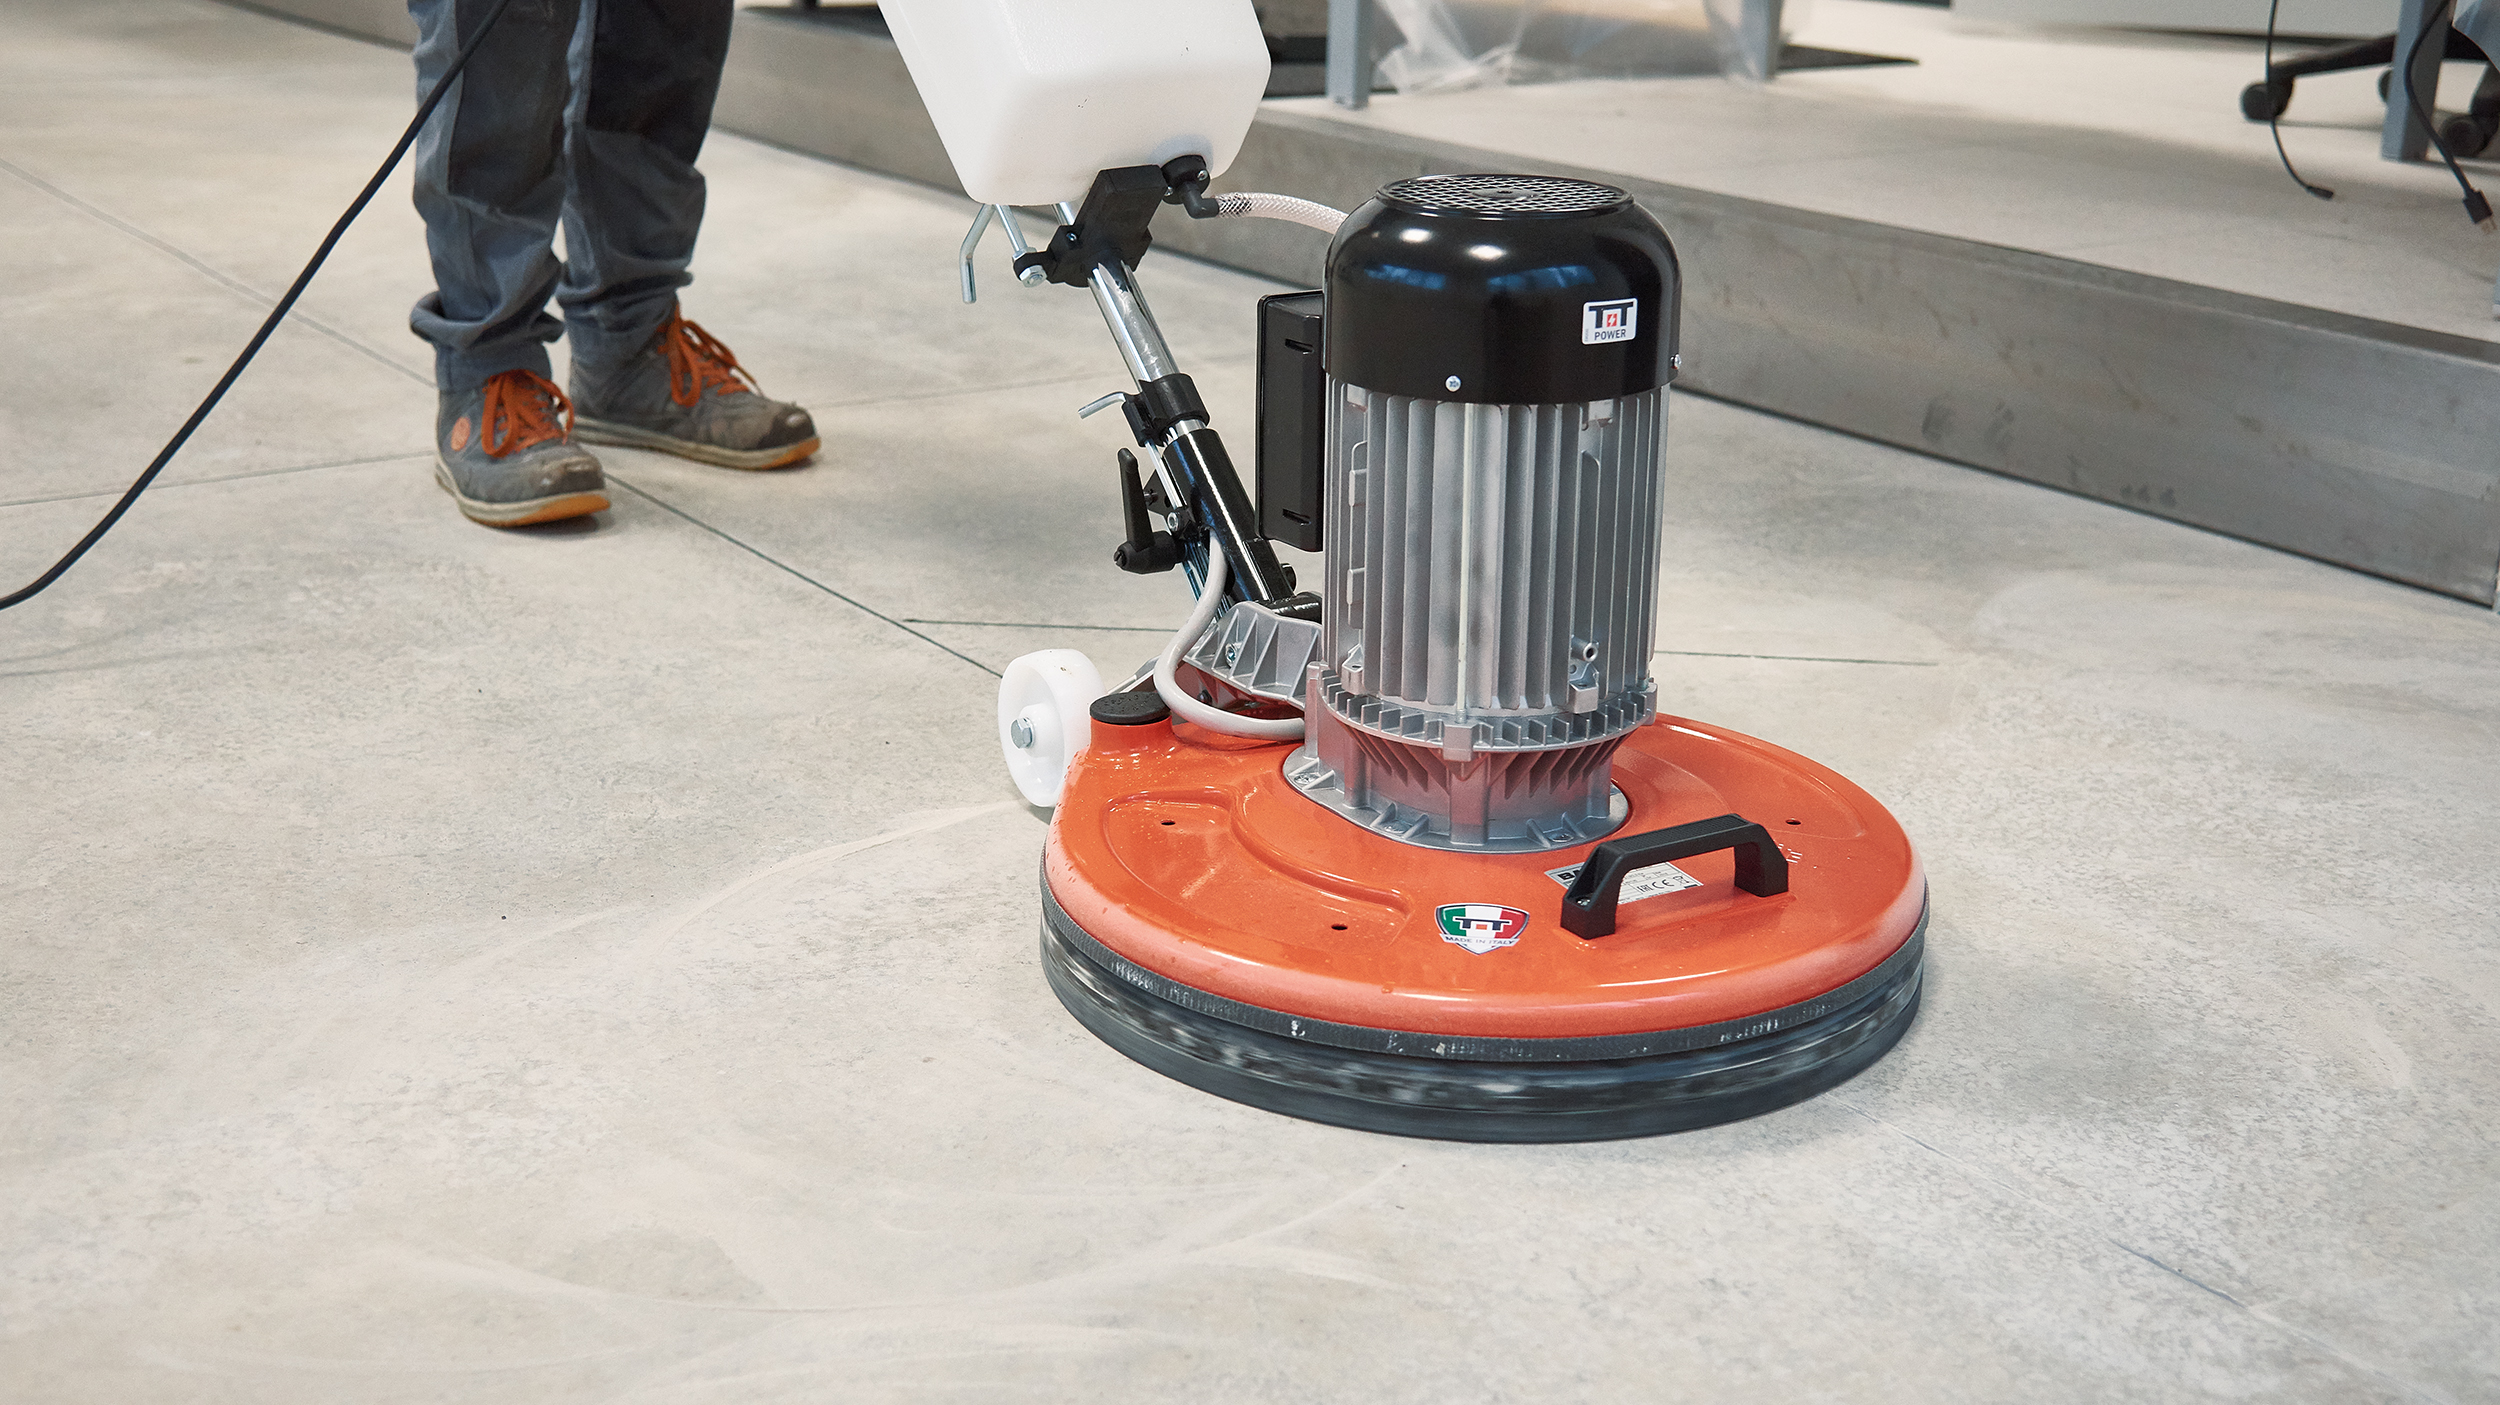 MASTERLINDA: Macchina per pulizia pavimenti